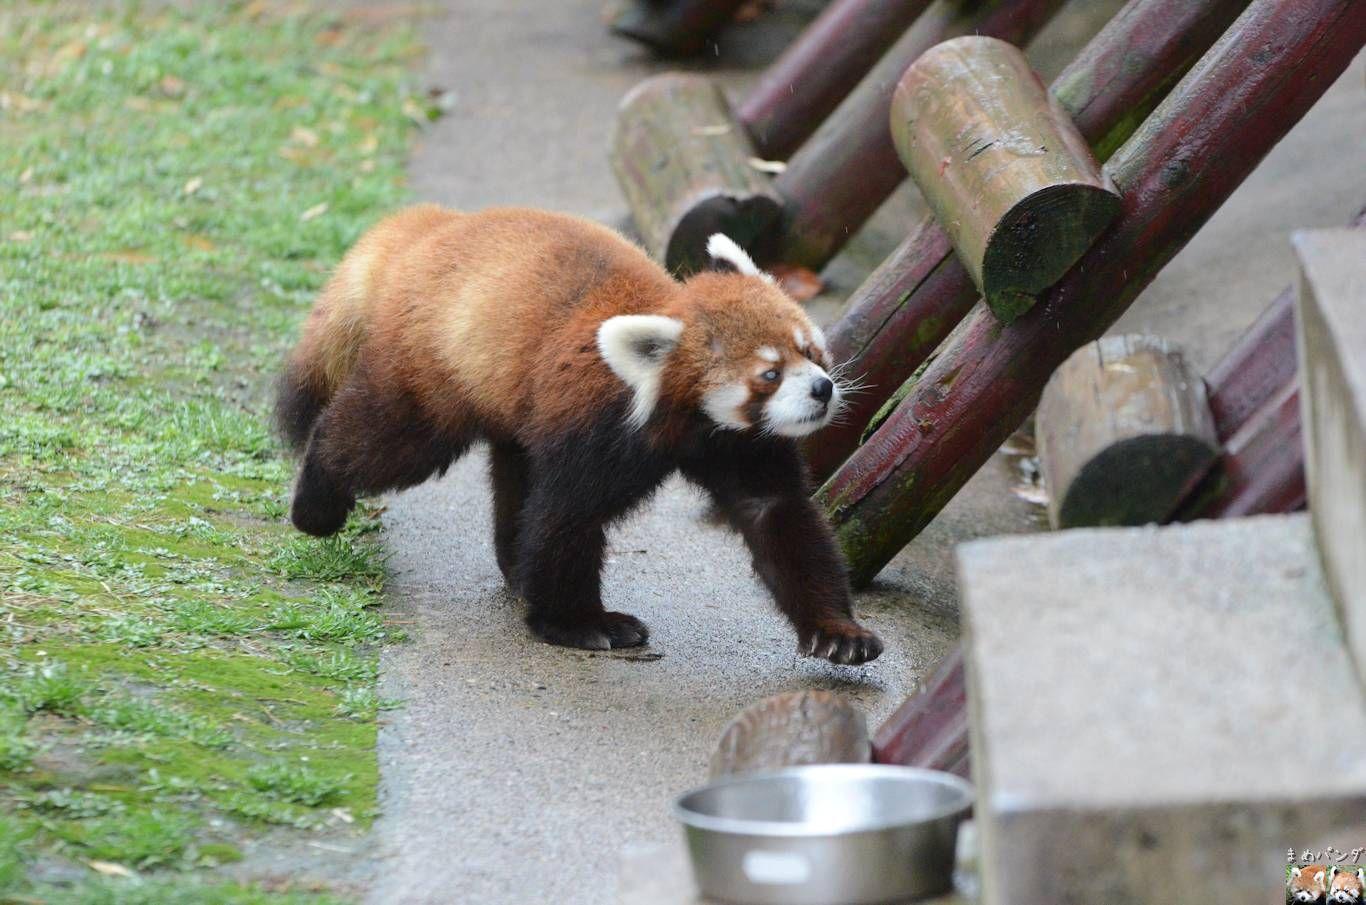 Red panda at Oomoriyama Zoo, Japan.